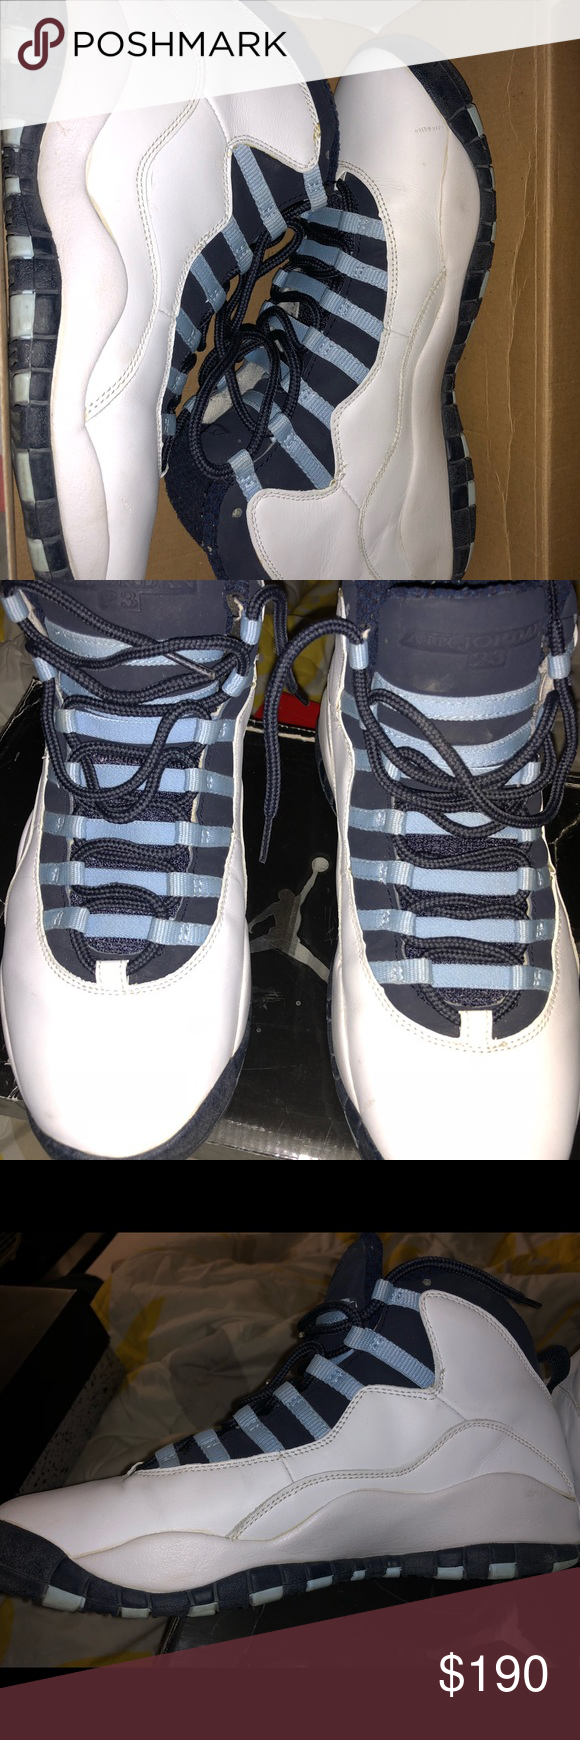 dbaa97c42472 Men s Air Jordan Original North Carolina Retro 10 Gently worn men s  Original North Carolina Retro 10. Released in 04  Size 10.5 slight scuff on  one shoe ...